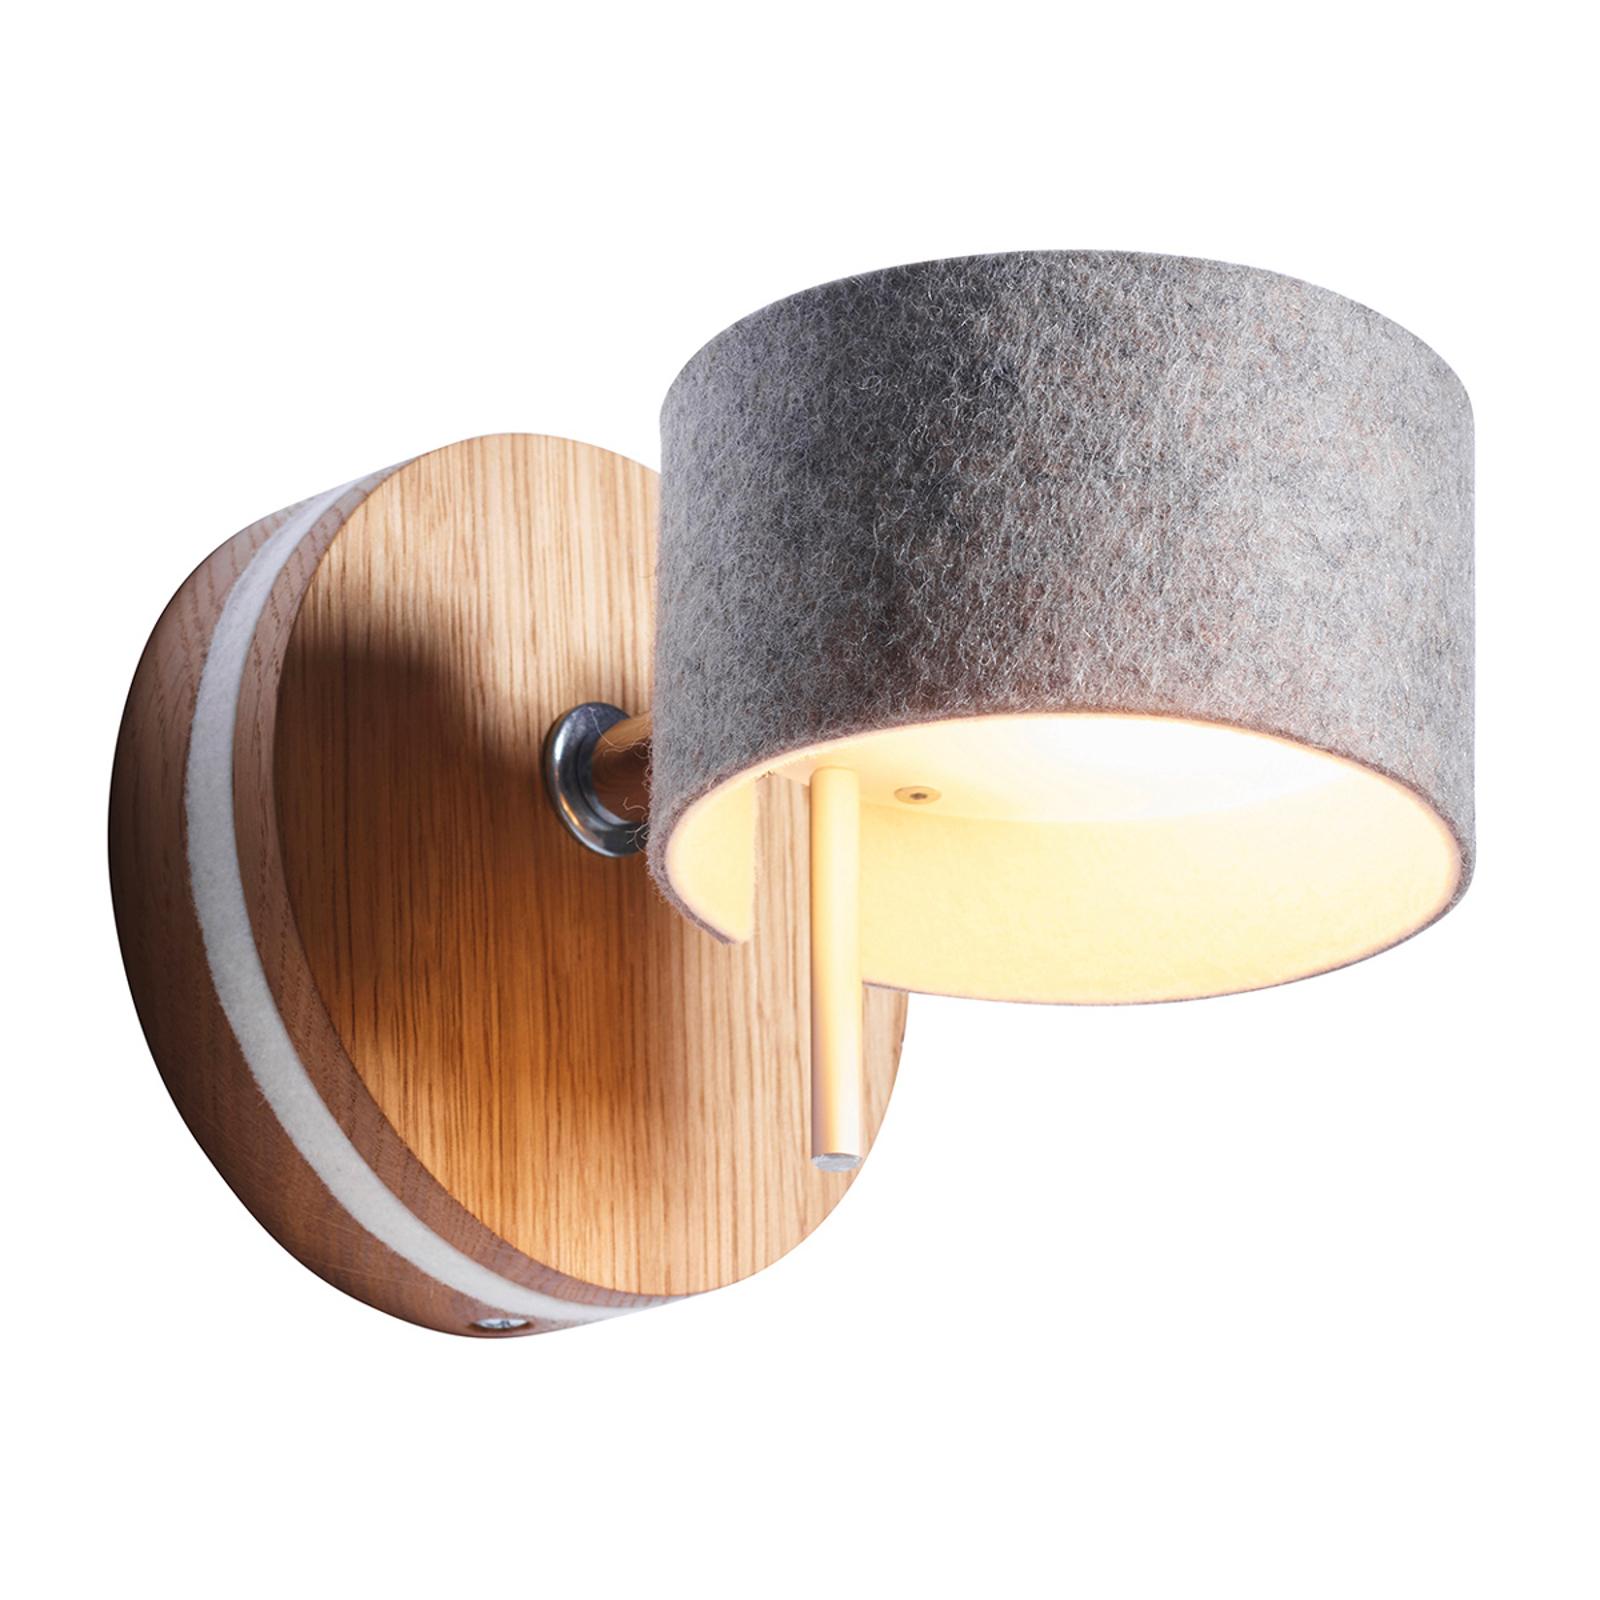 LED-Wandleuchte Frits mit Eichenholz und Filz